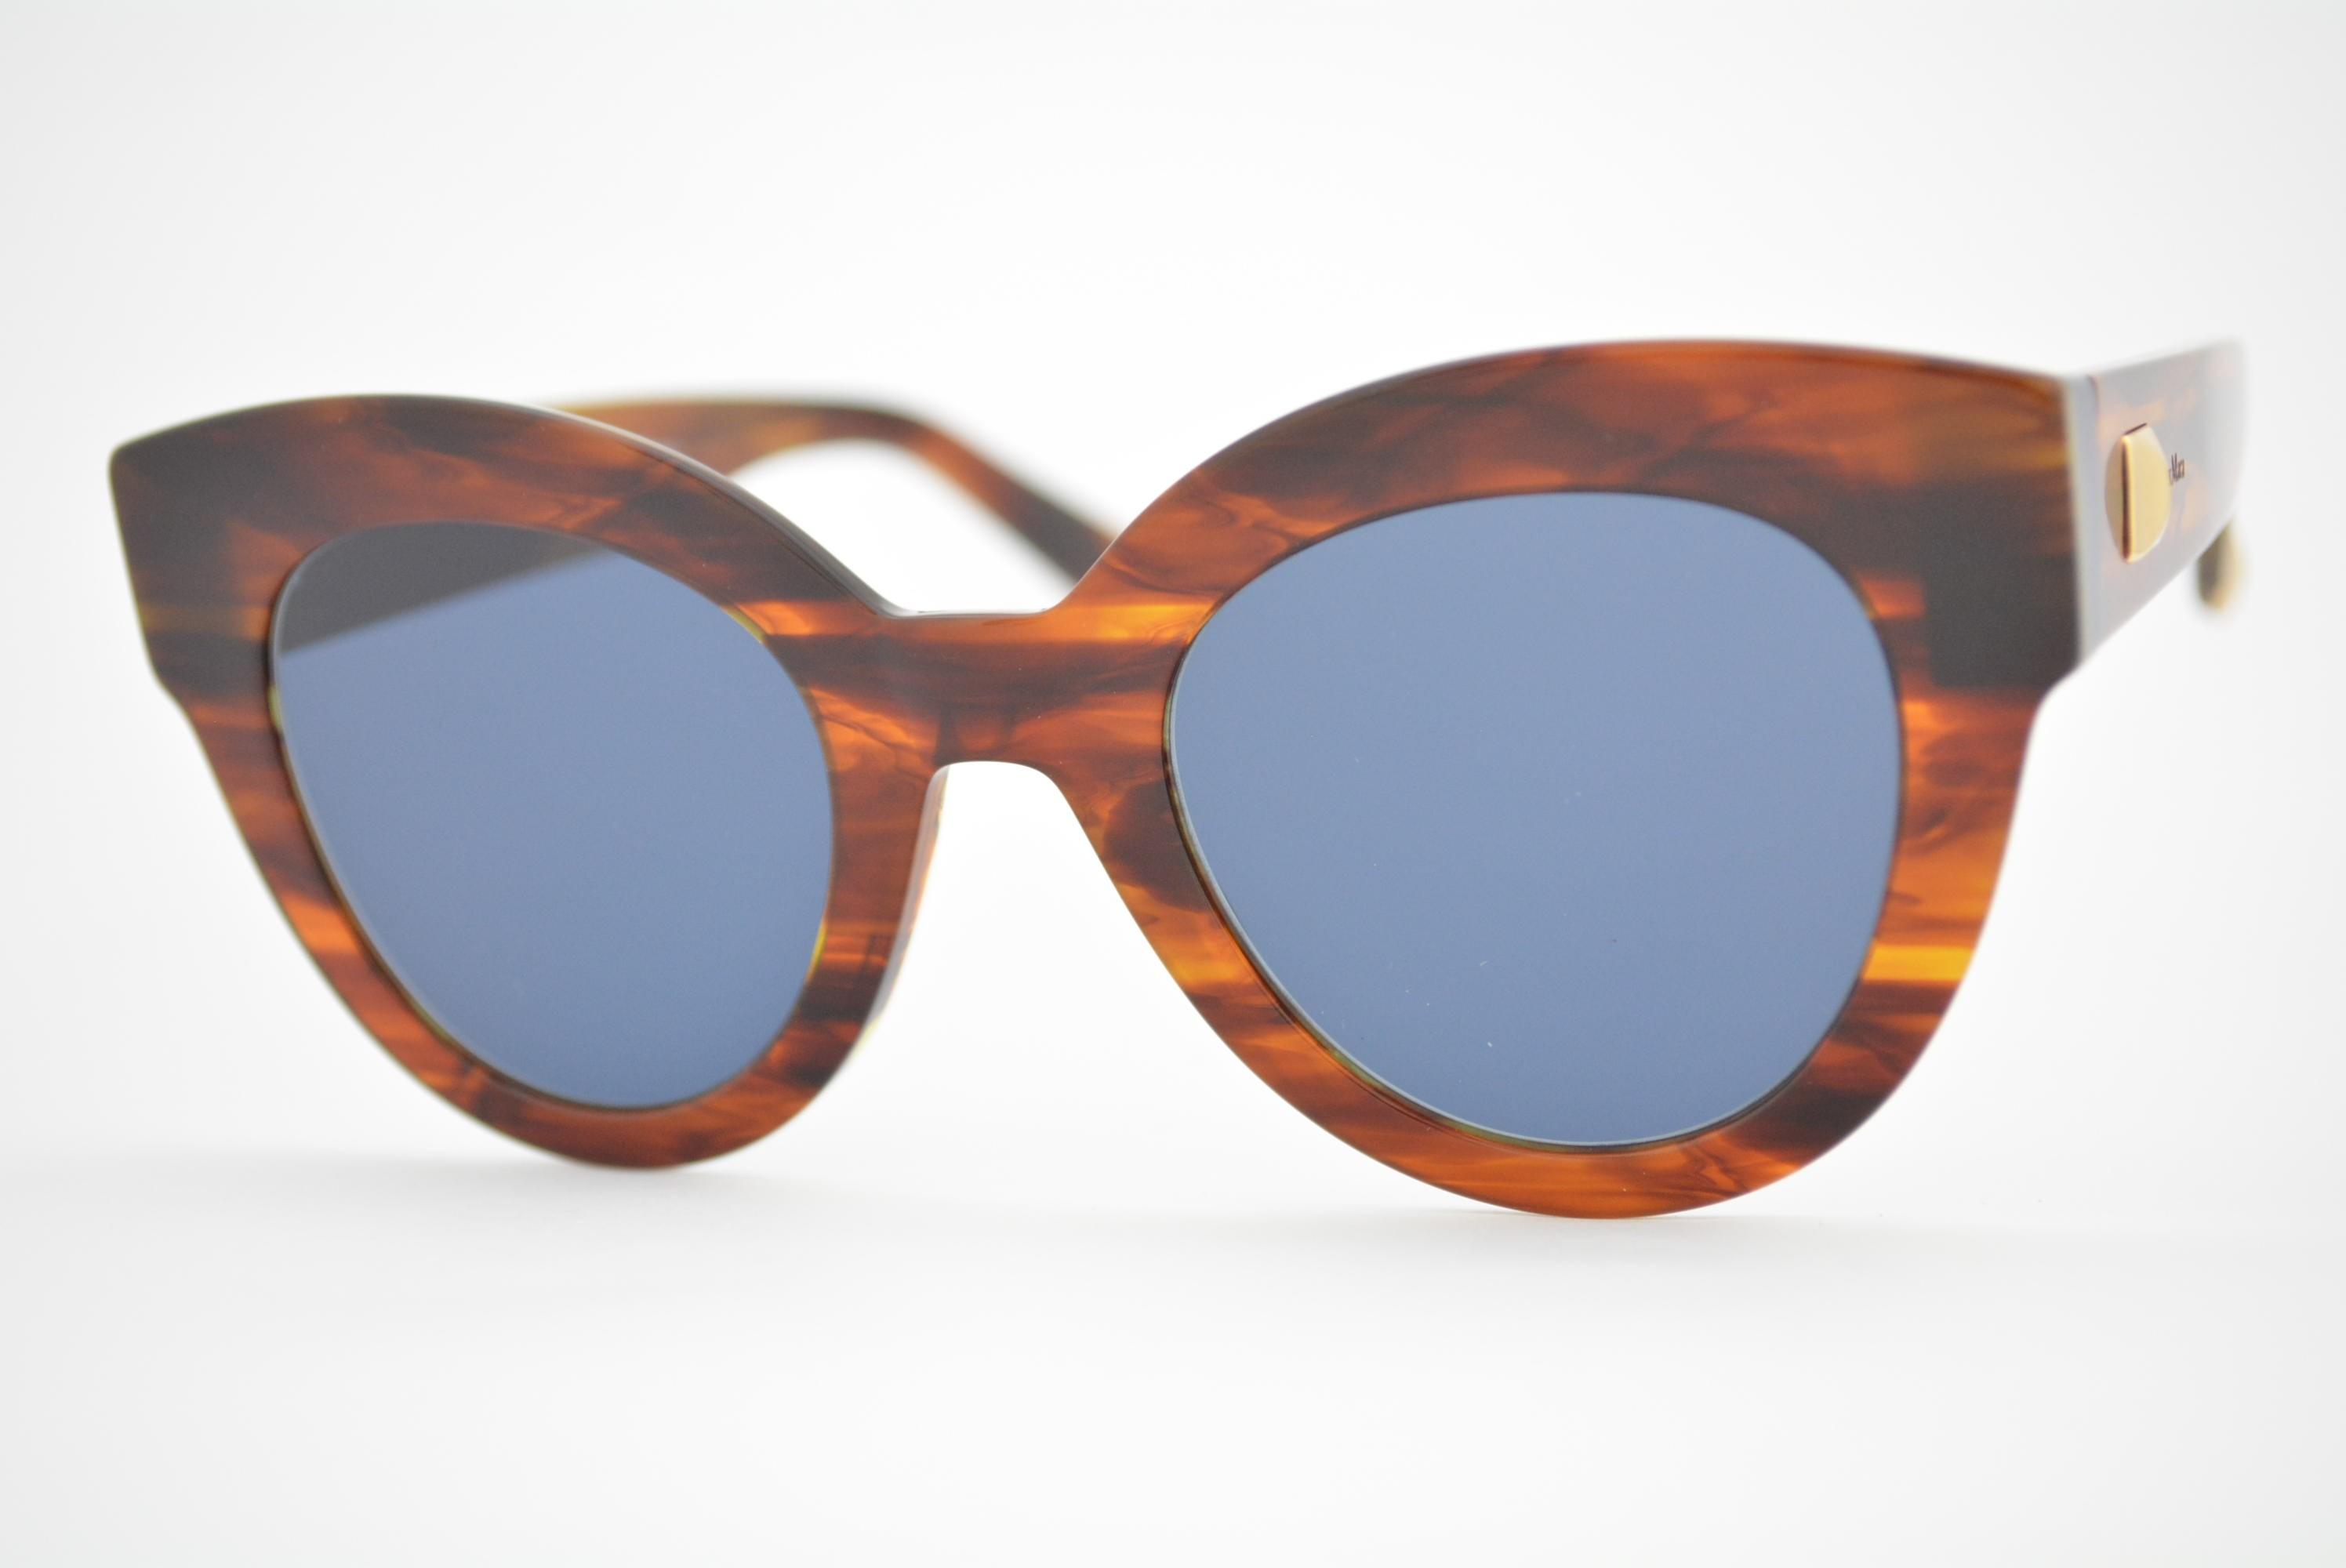 0d1c5819c82b2 óculos de sol Max Mara mod MM Flat I ex4ku Ótica Cardoso